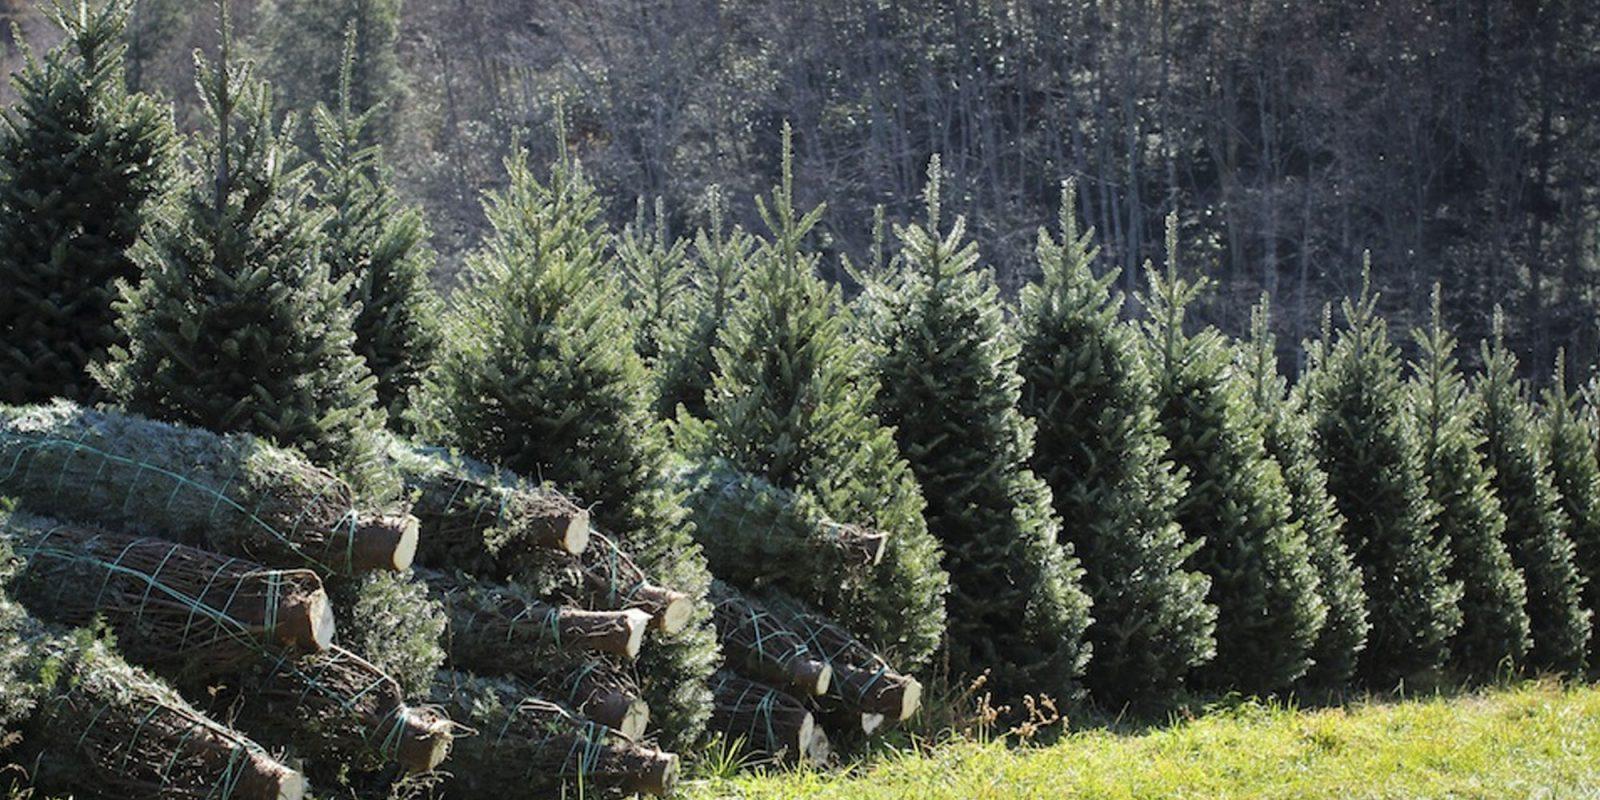 amazon set to sell 7 foot christmas trees more online this holiday season - Amazon Com Christmas Trees